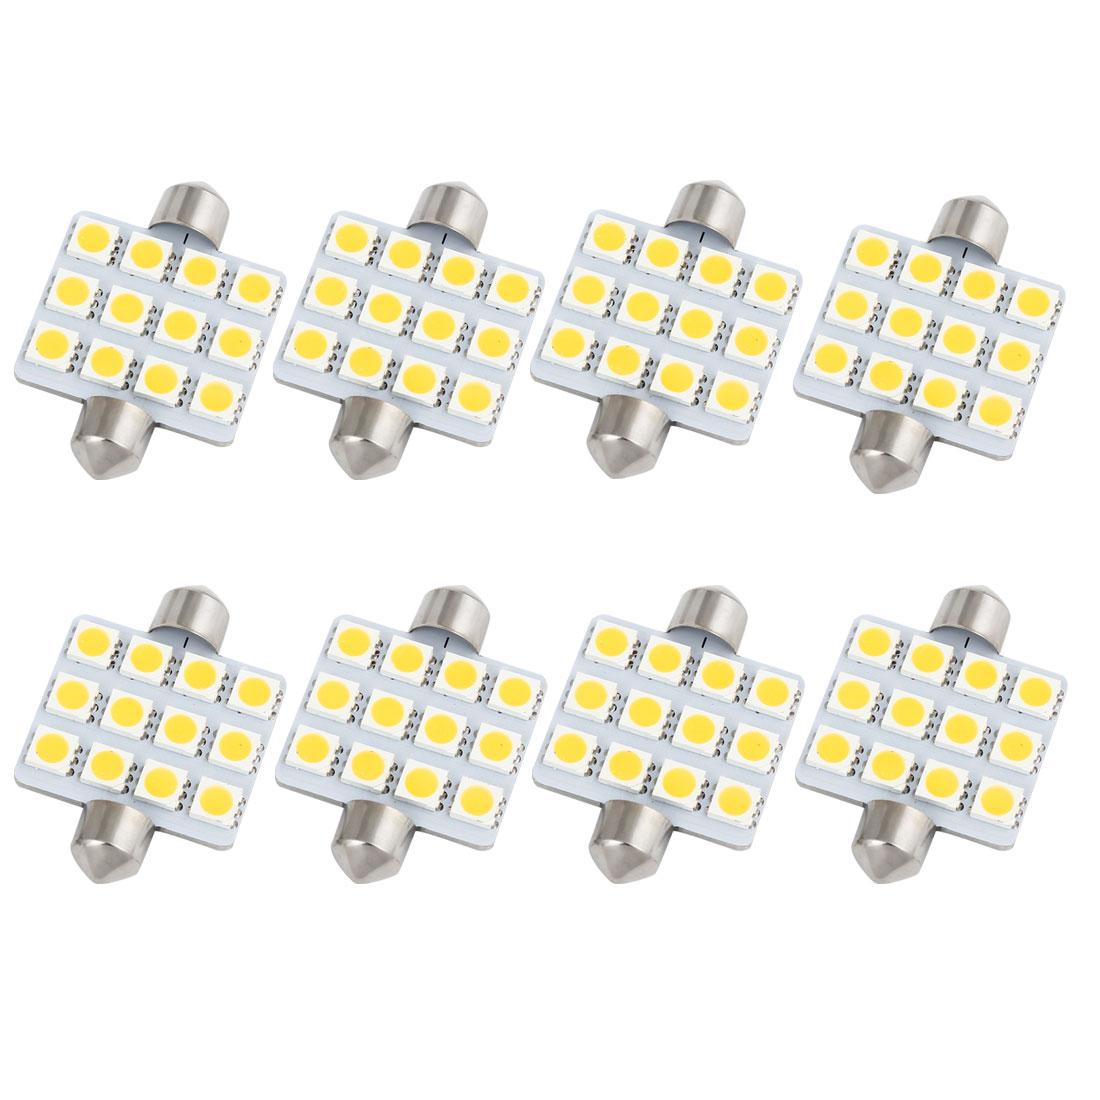 "8Pcs 42mm 1.65"" 5050 SMD 12-LED Festoon Dome Light Warm White 211 560 578 Internal"